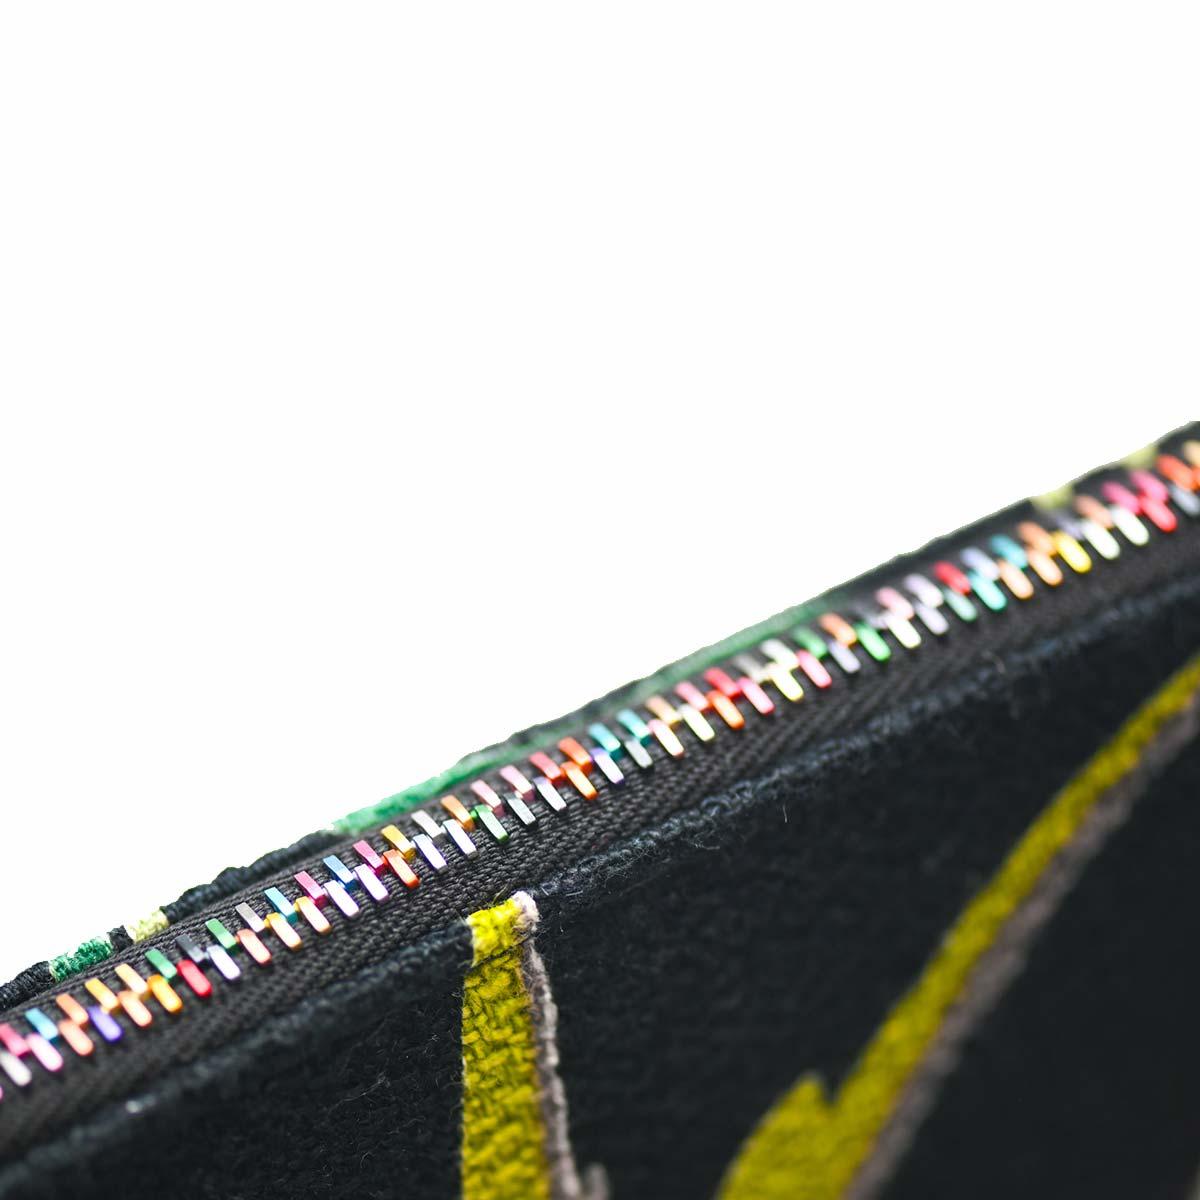 clutch bag bird motif mid century modern on black DSC 6211